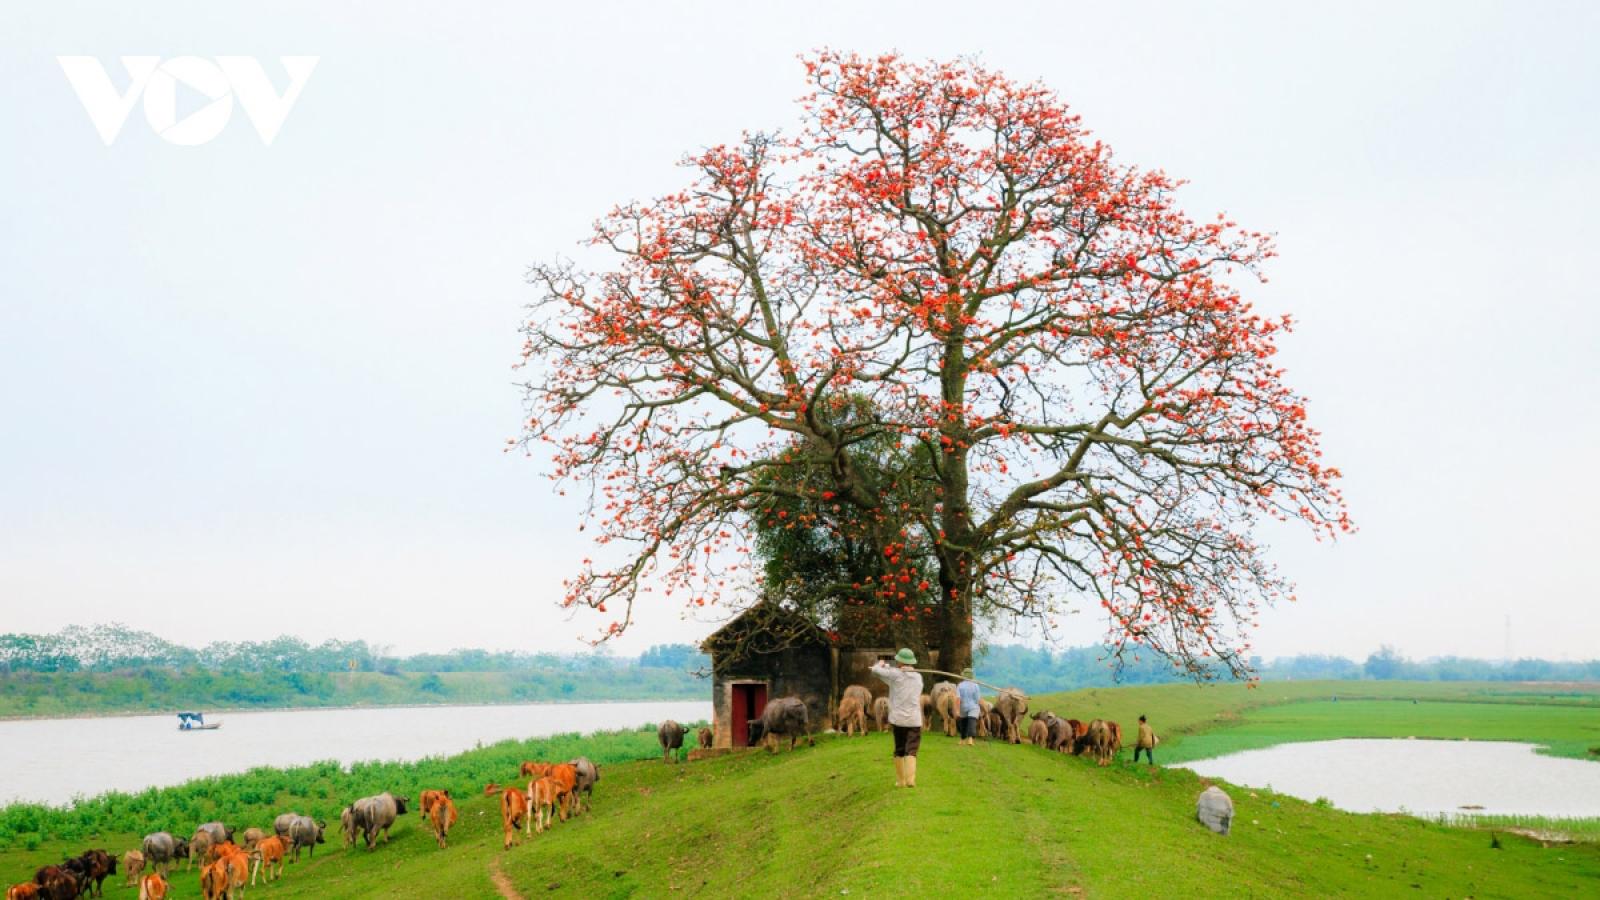 Bombax ceiba in full bloom across northern village